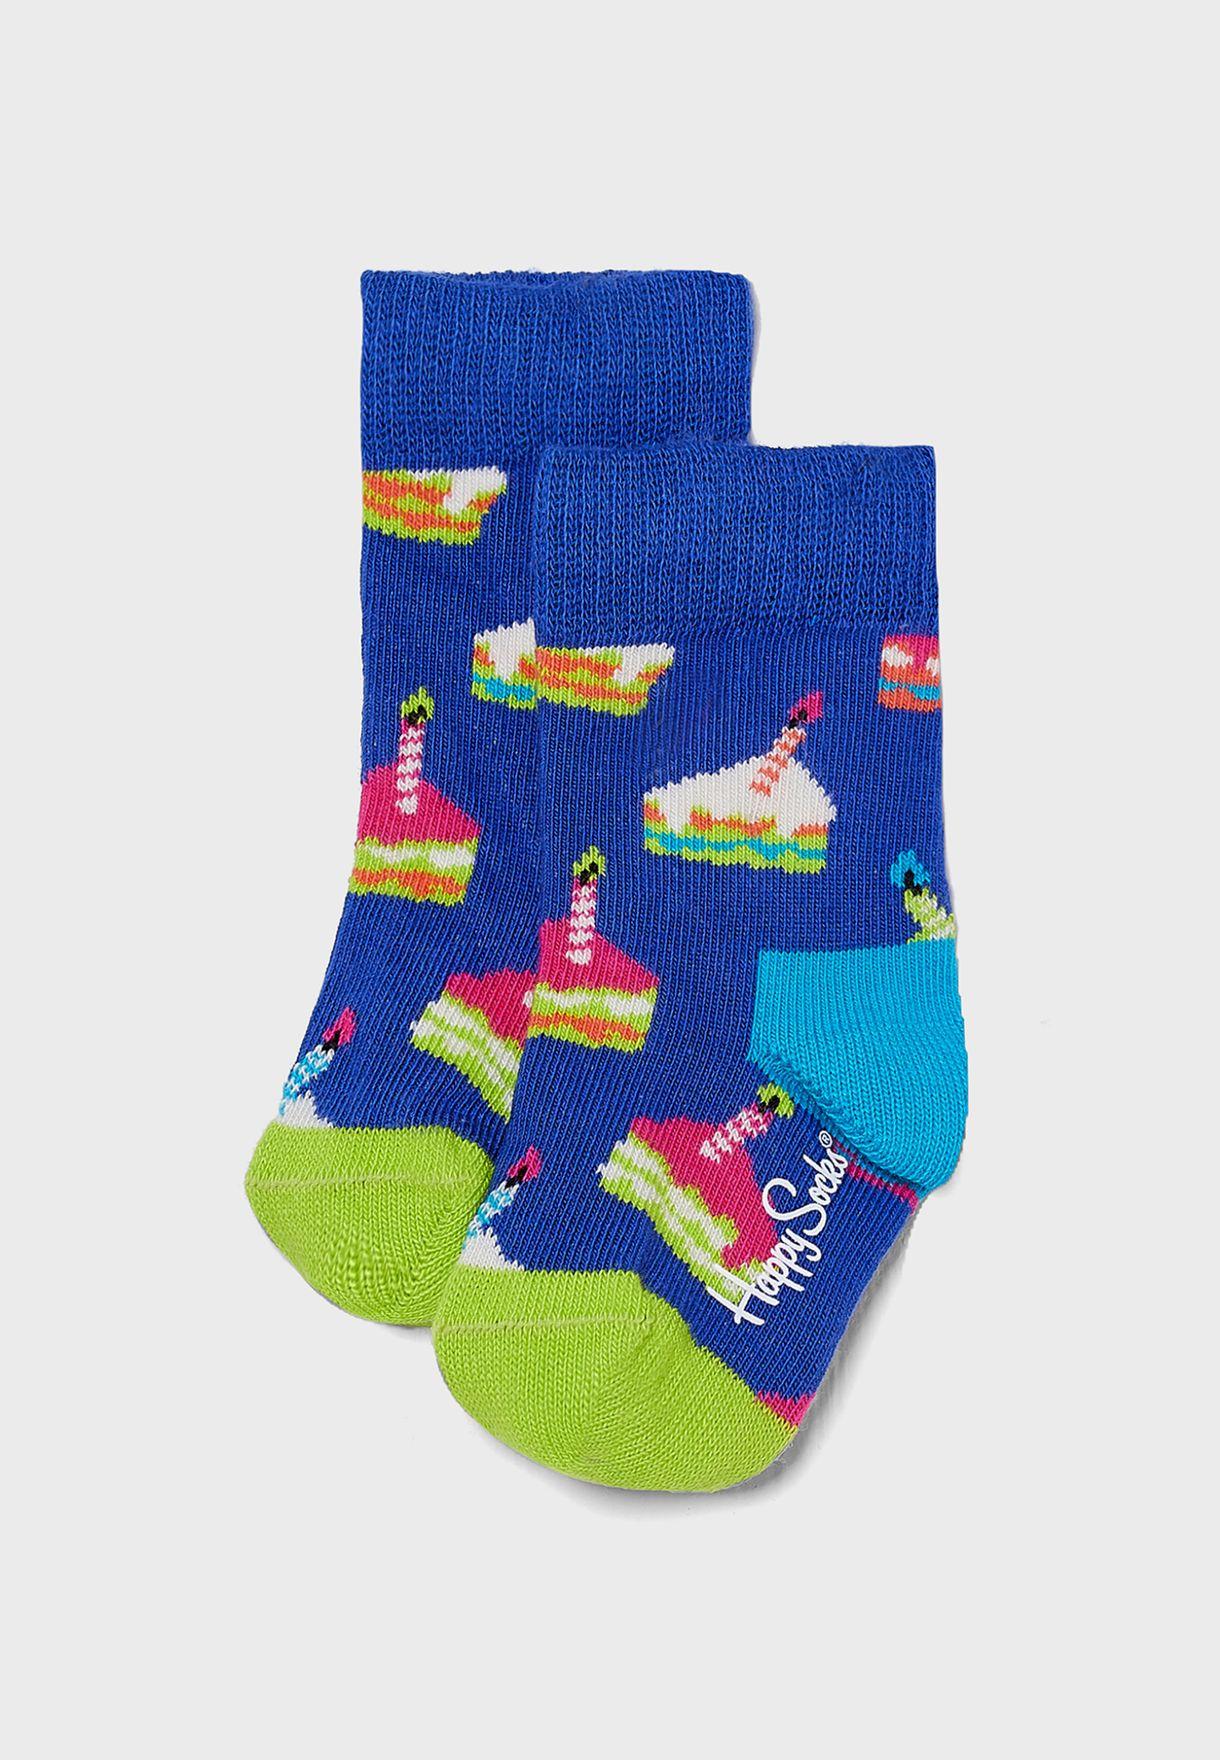 Kids Cake Socks